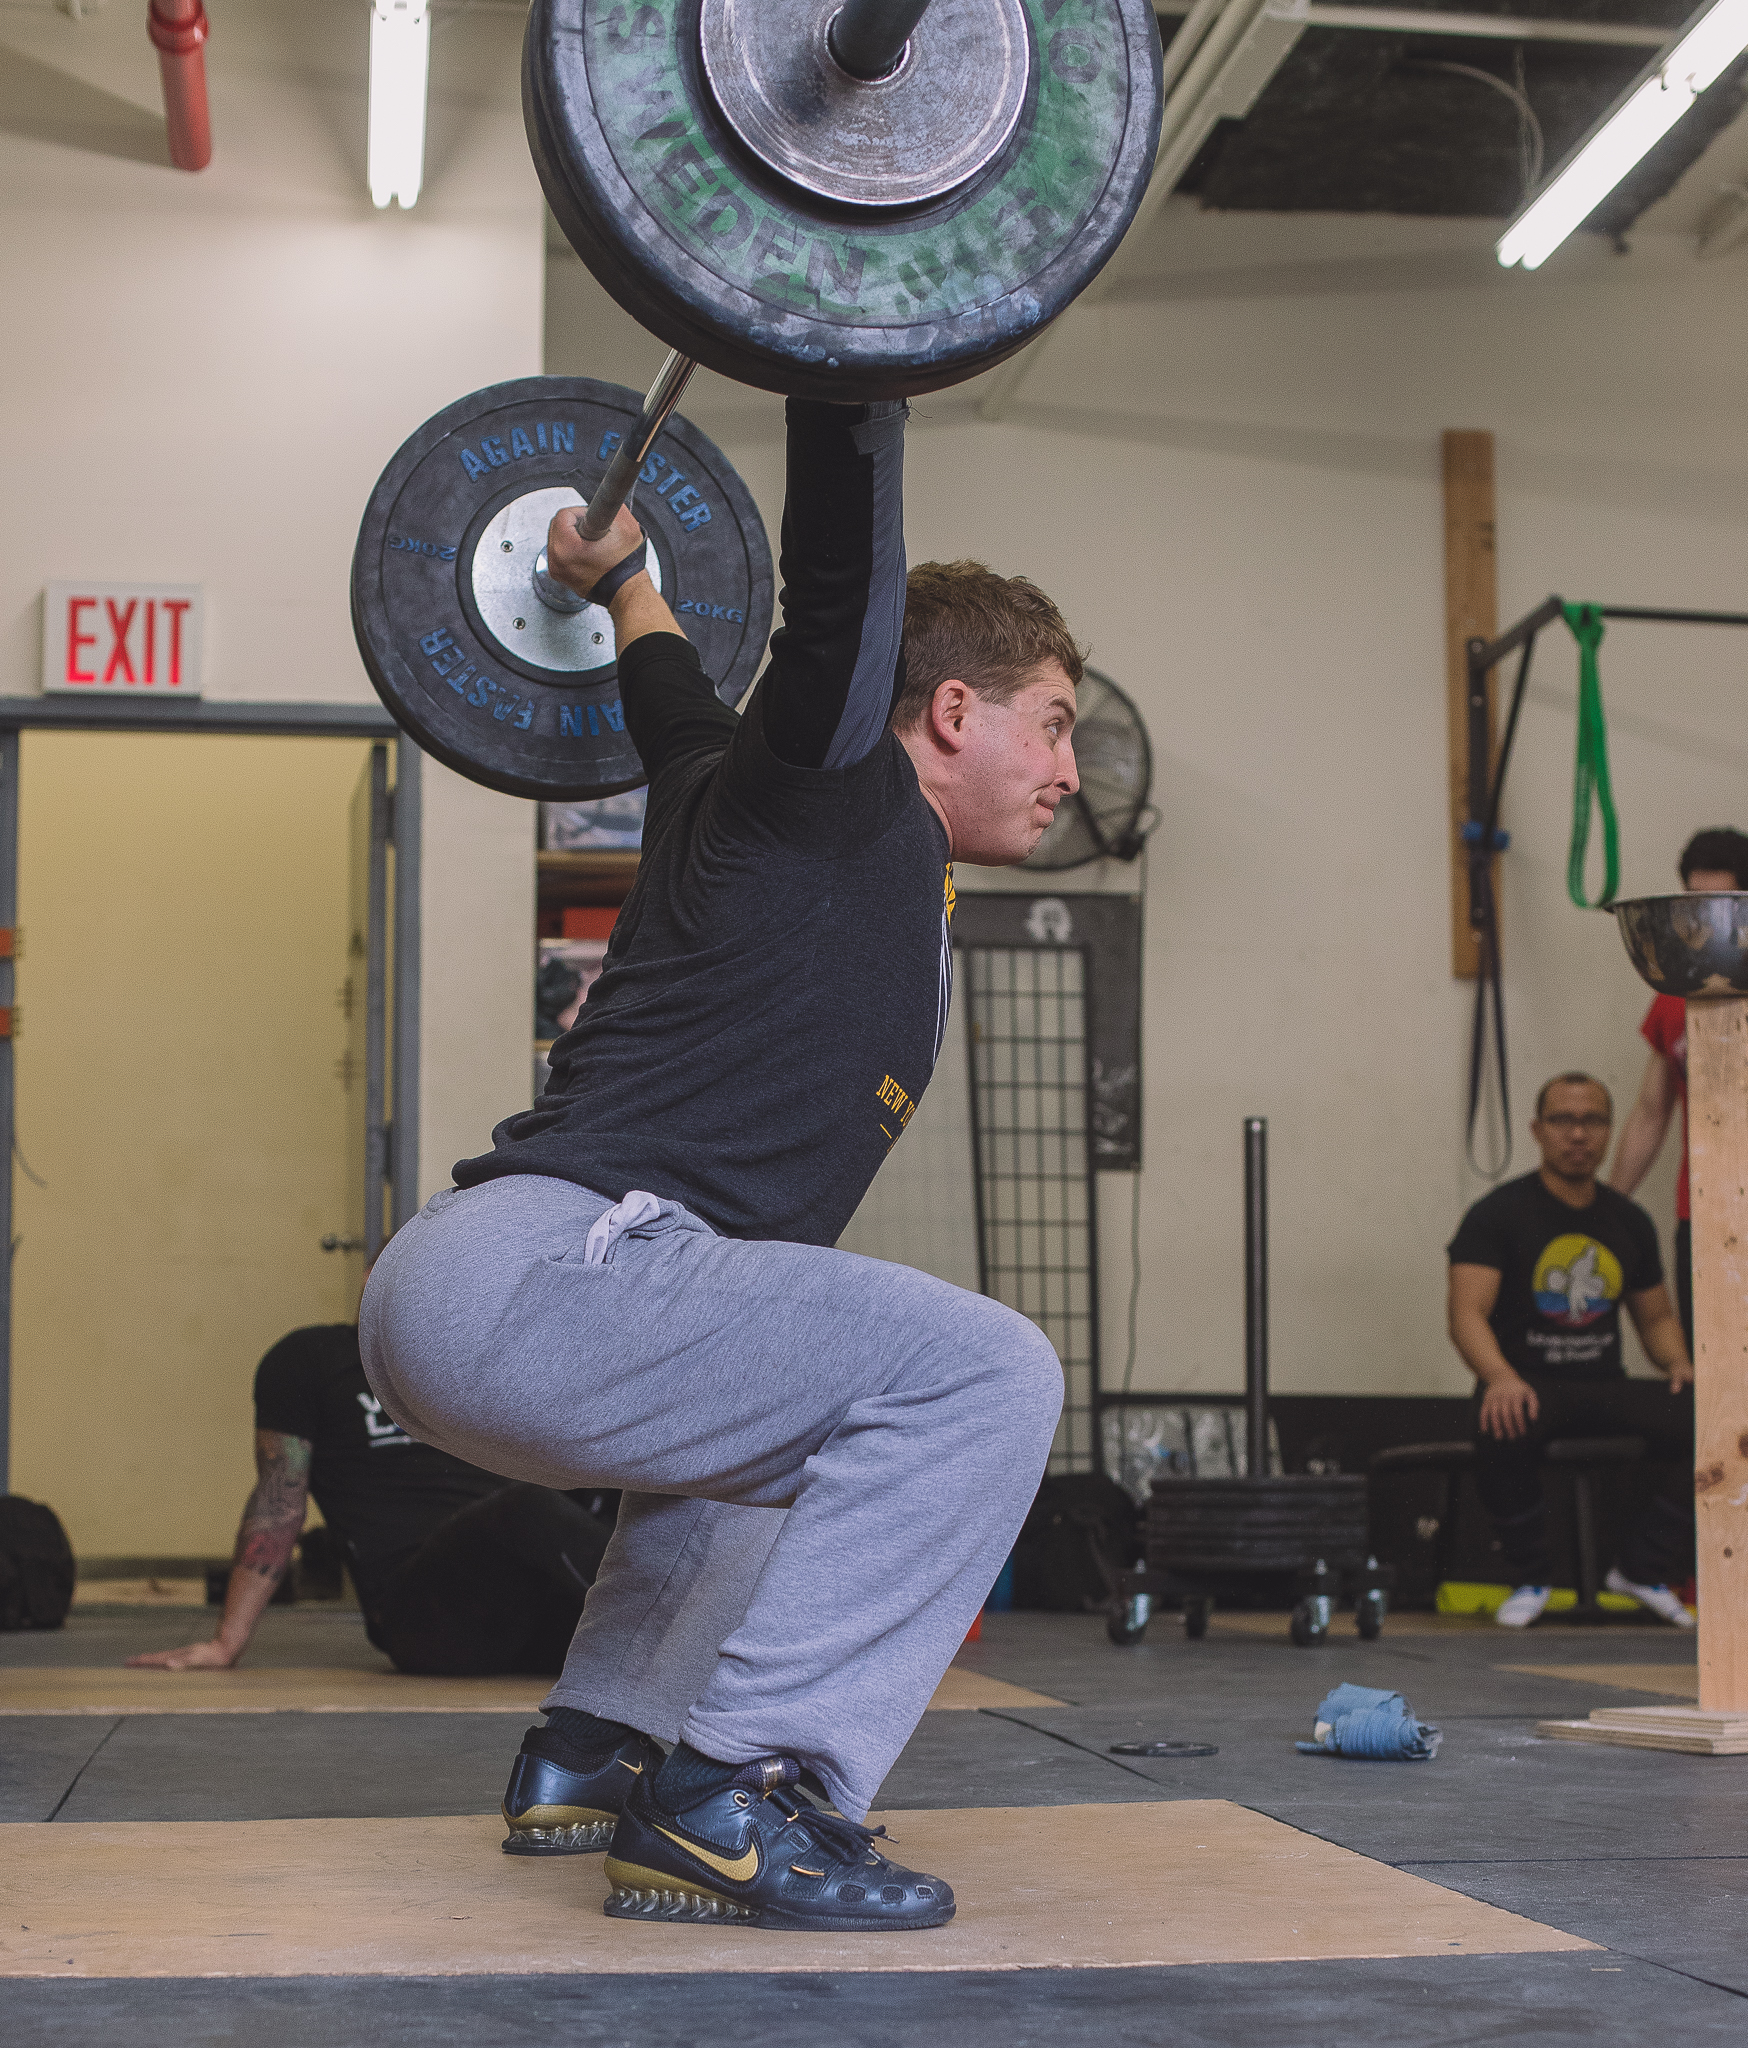 dan-casey-nywa-jdi-visit-weightlifting-coach-new-york-weightlifting-academy-11 2.jpg